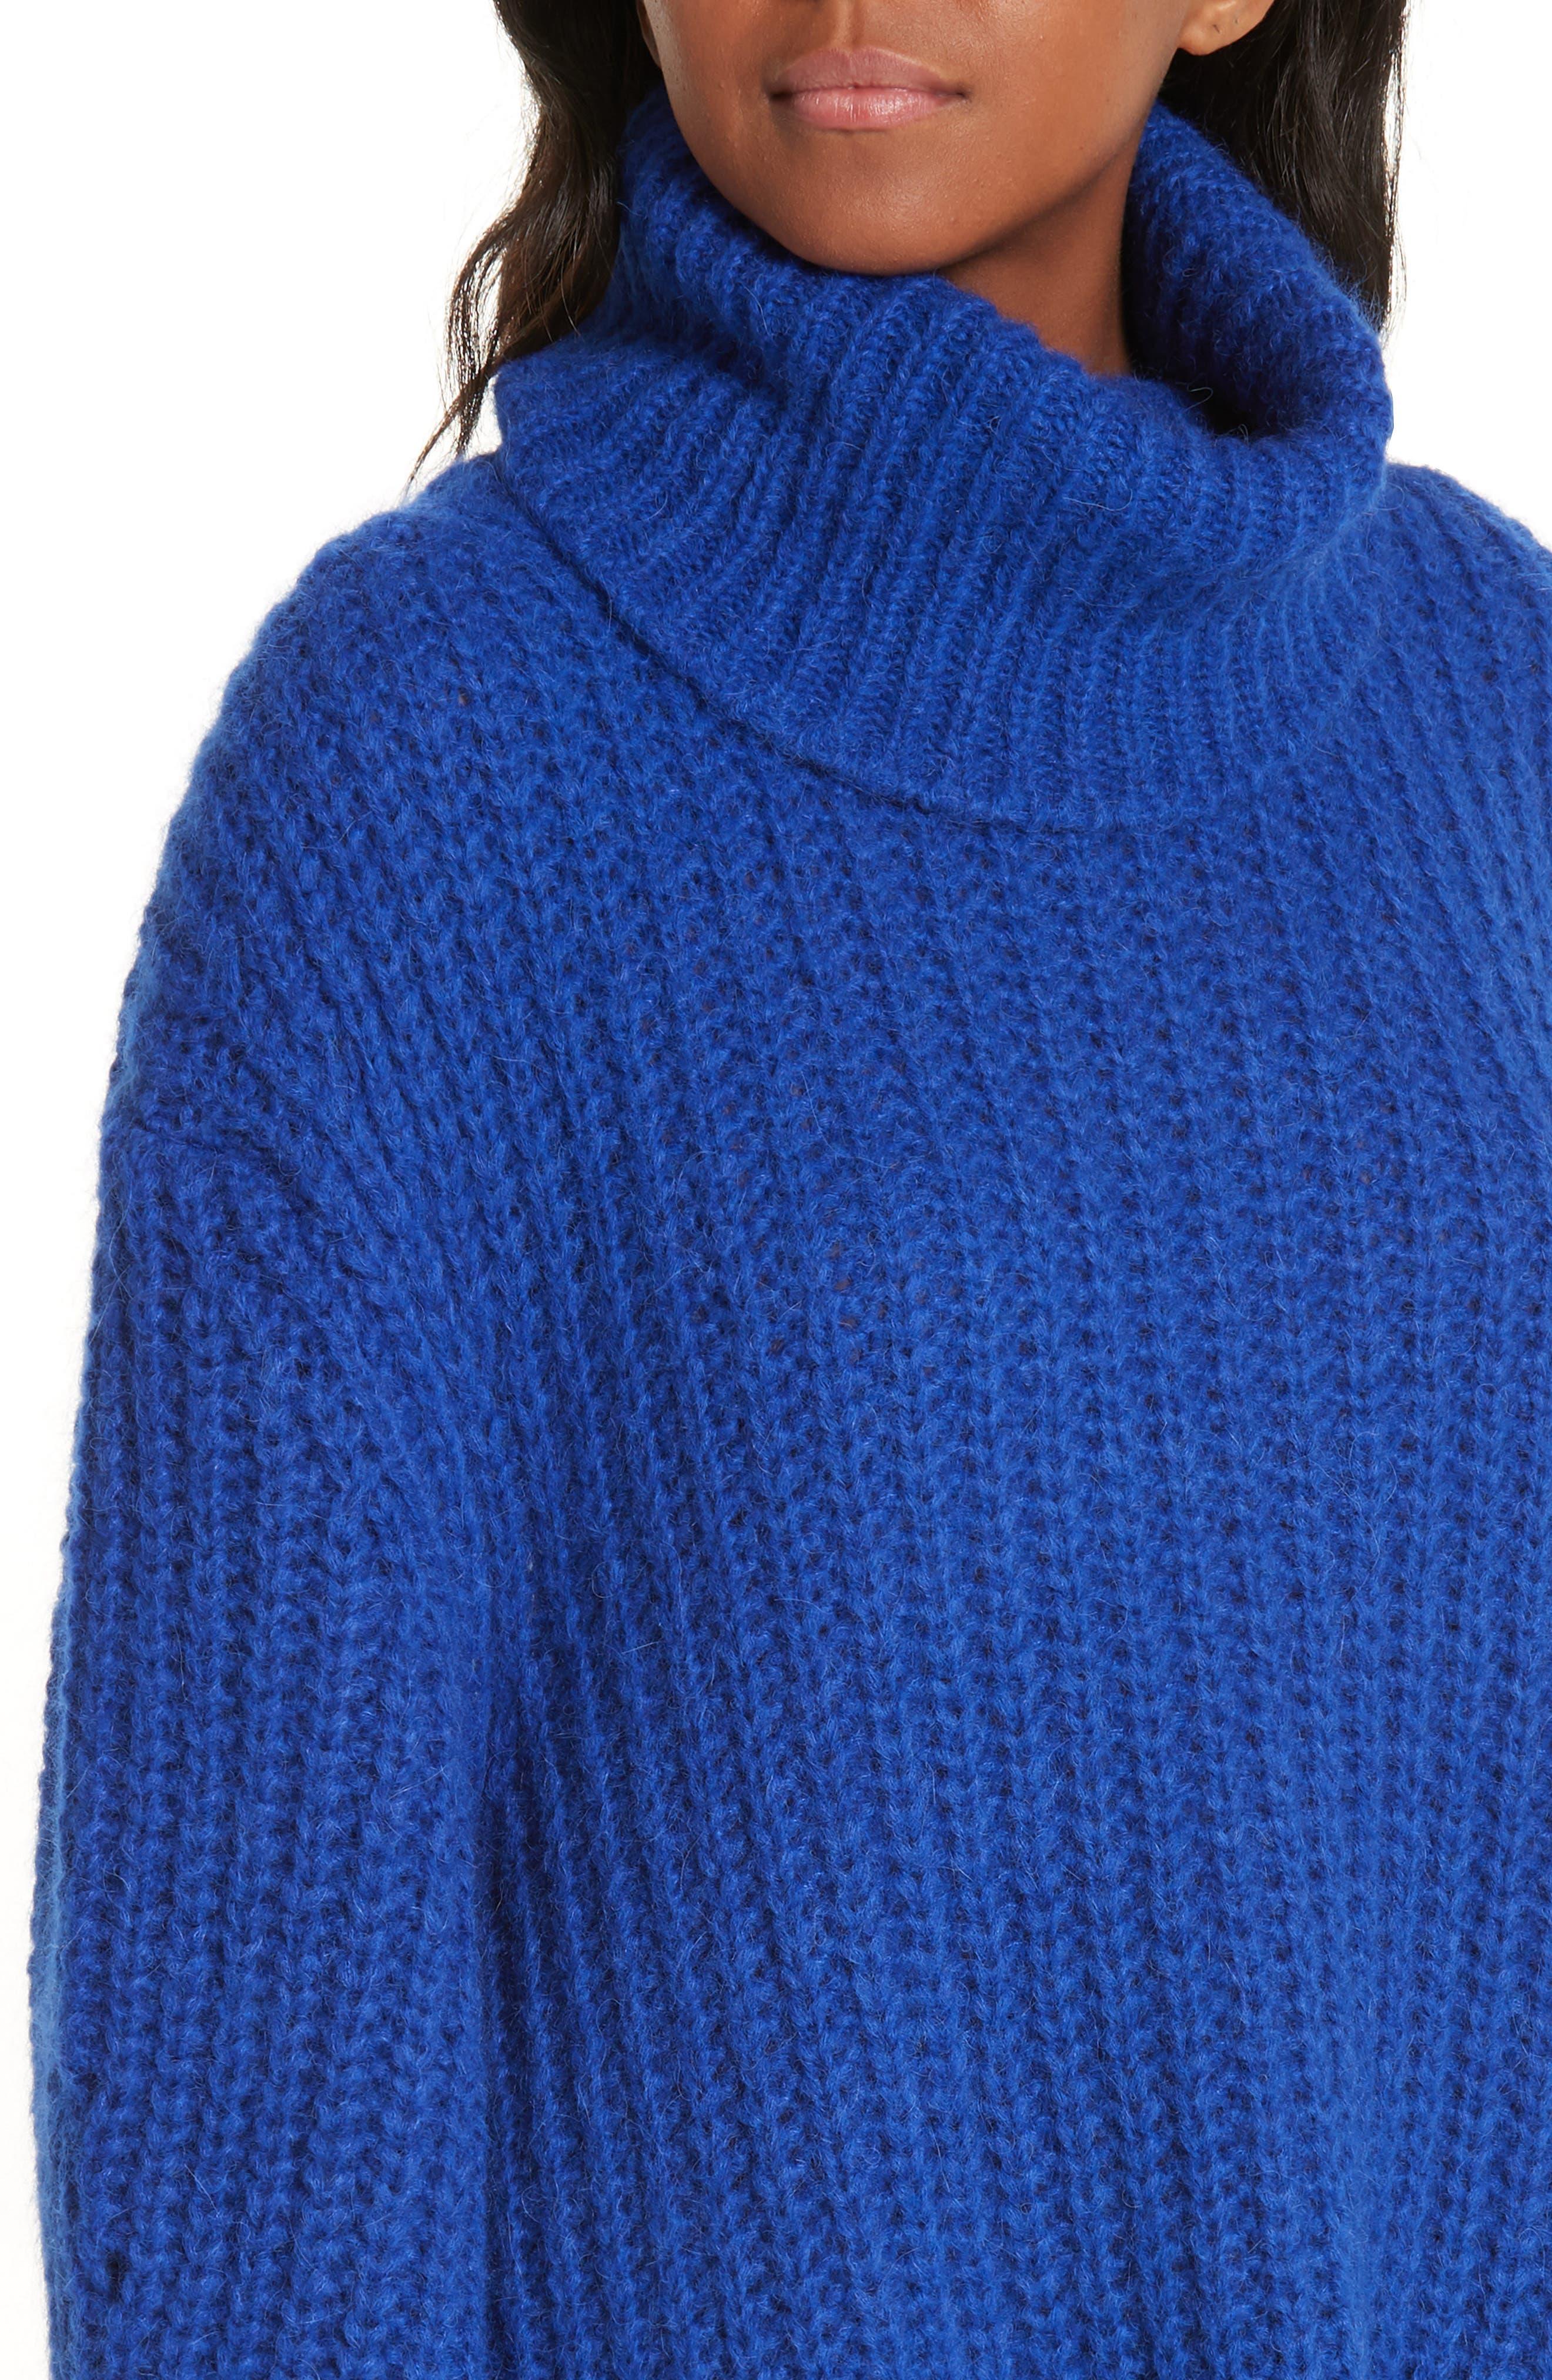 Emera Turtleneck Sweater,                             Alternate thumbnail 4, color,                             BLUE